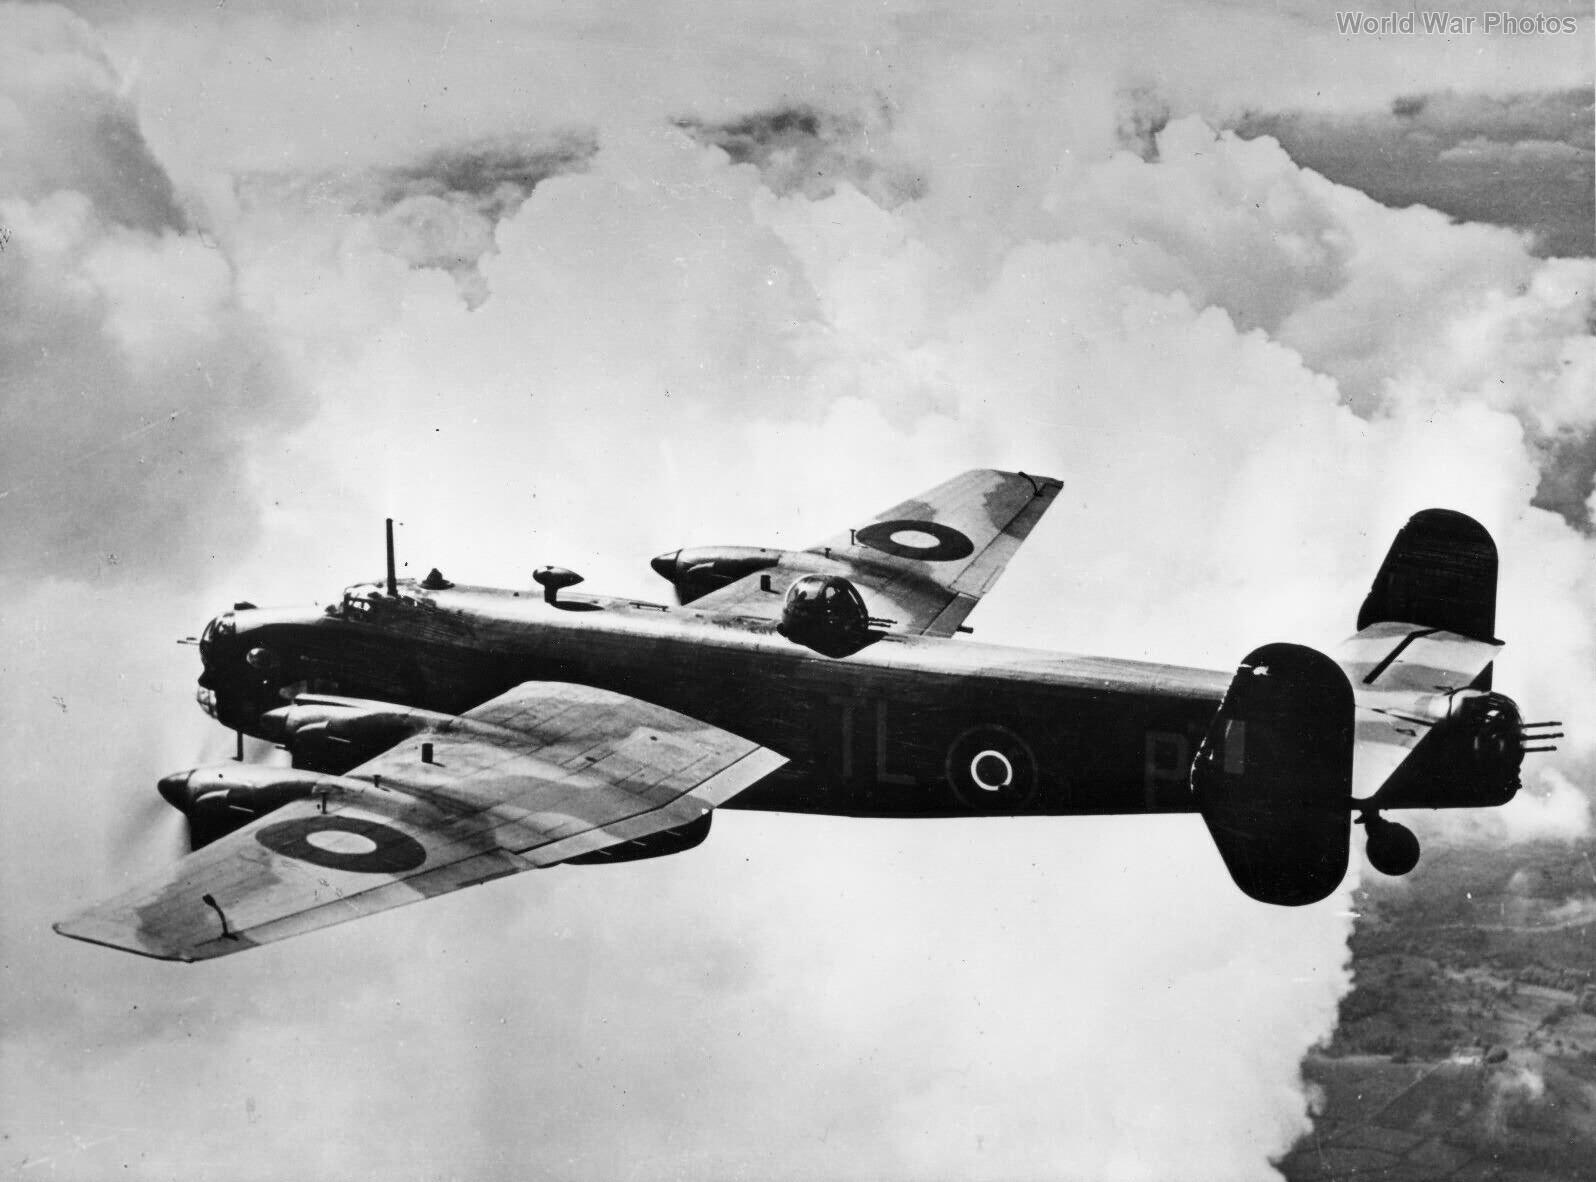 Handley Page Halifax W7676 TL-P